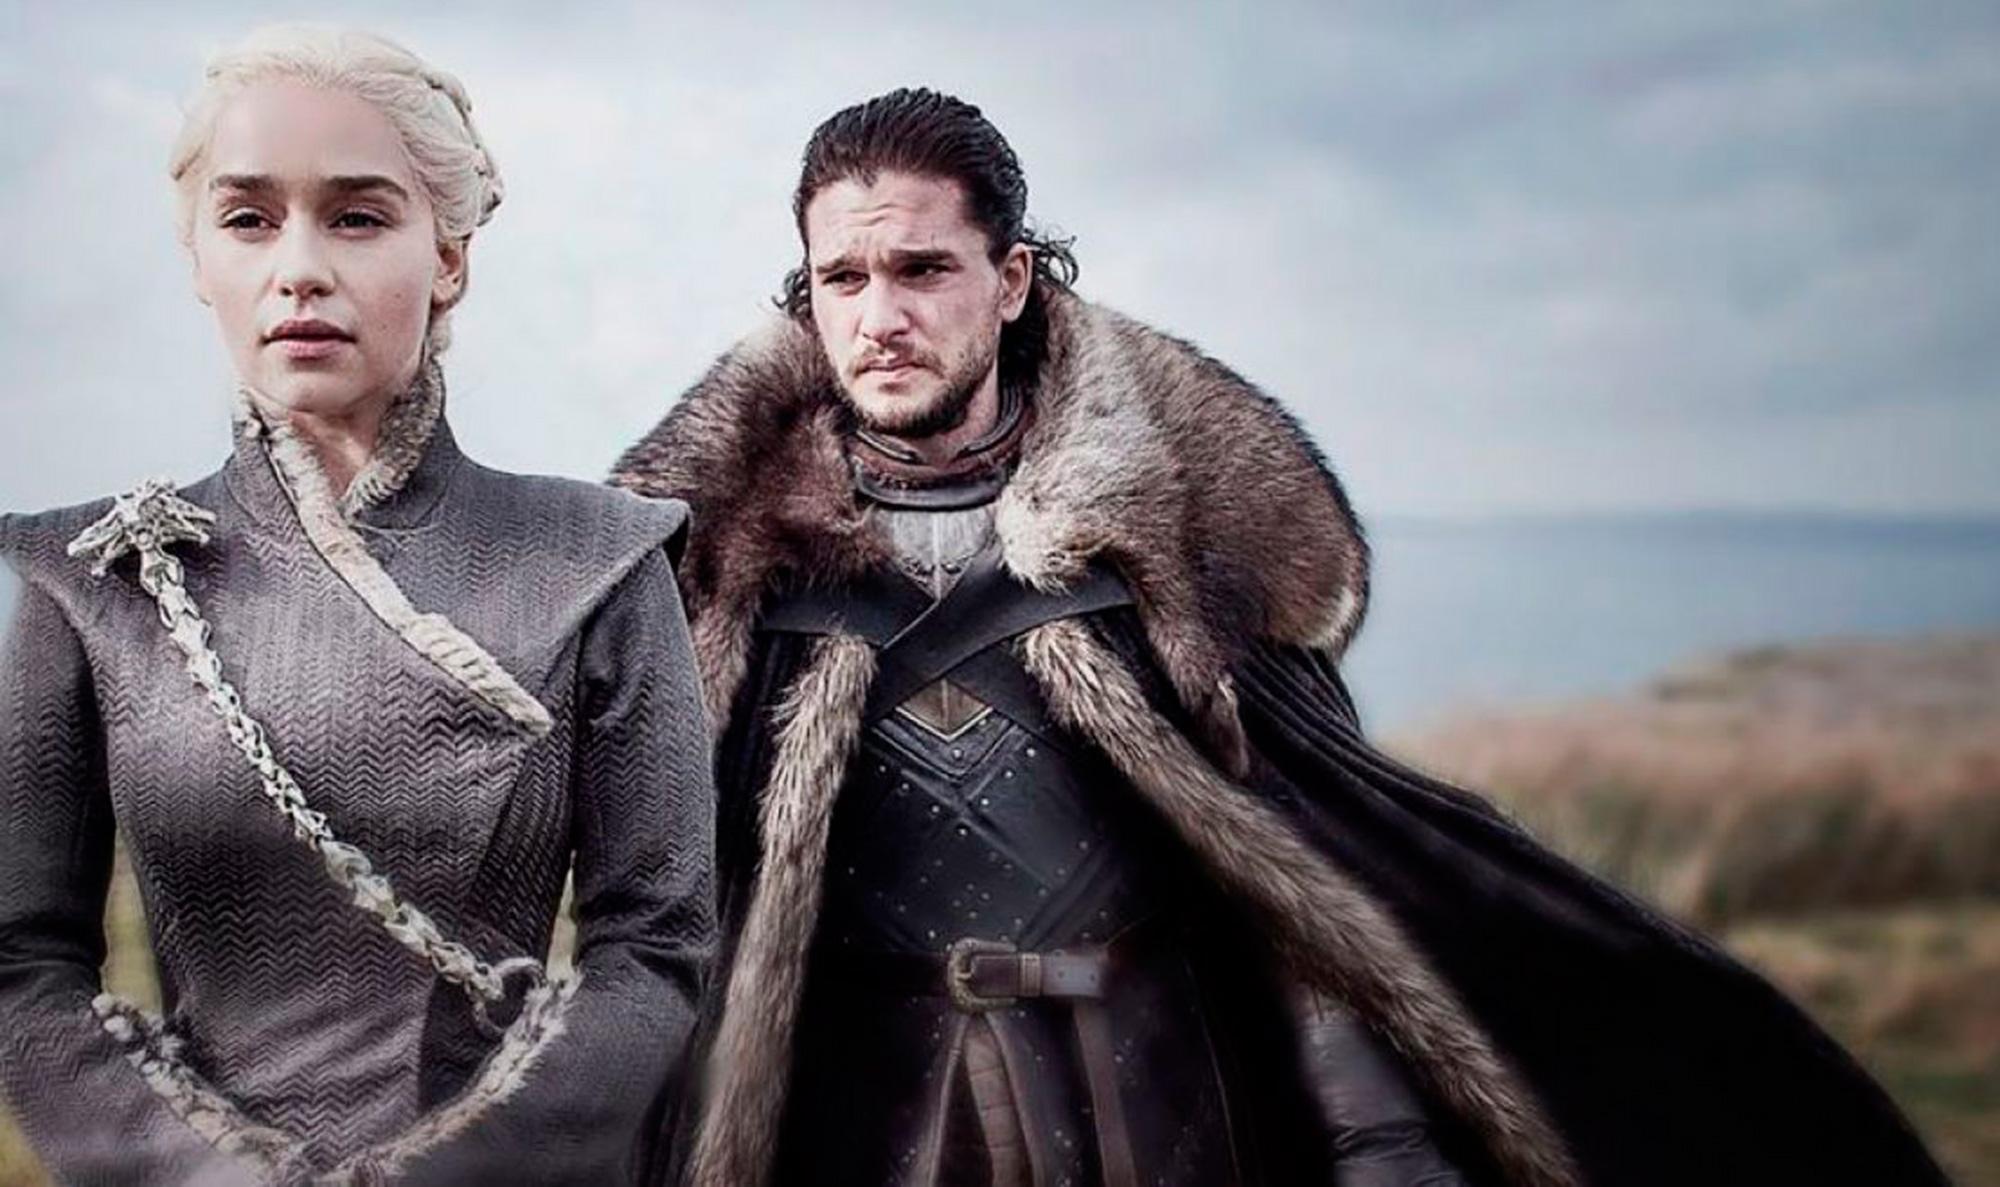 Daenerys Targaryen y Jon Snow acabaron muy bien la séptima temporada.